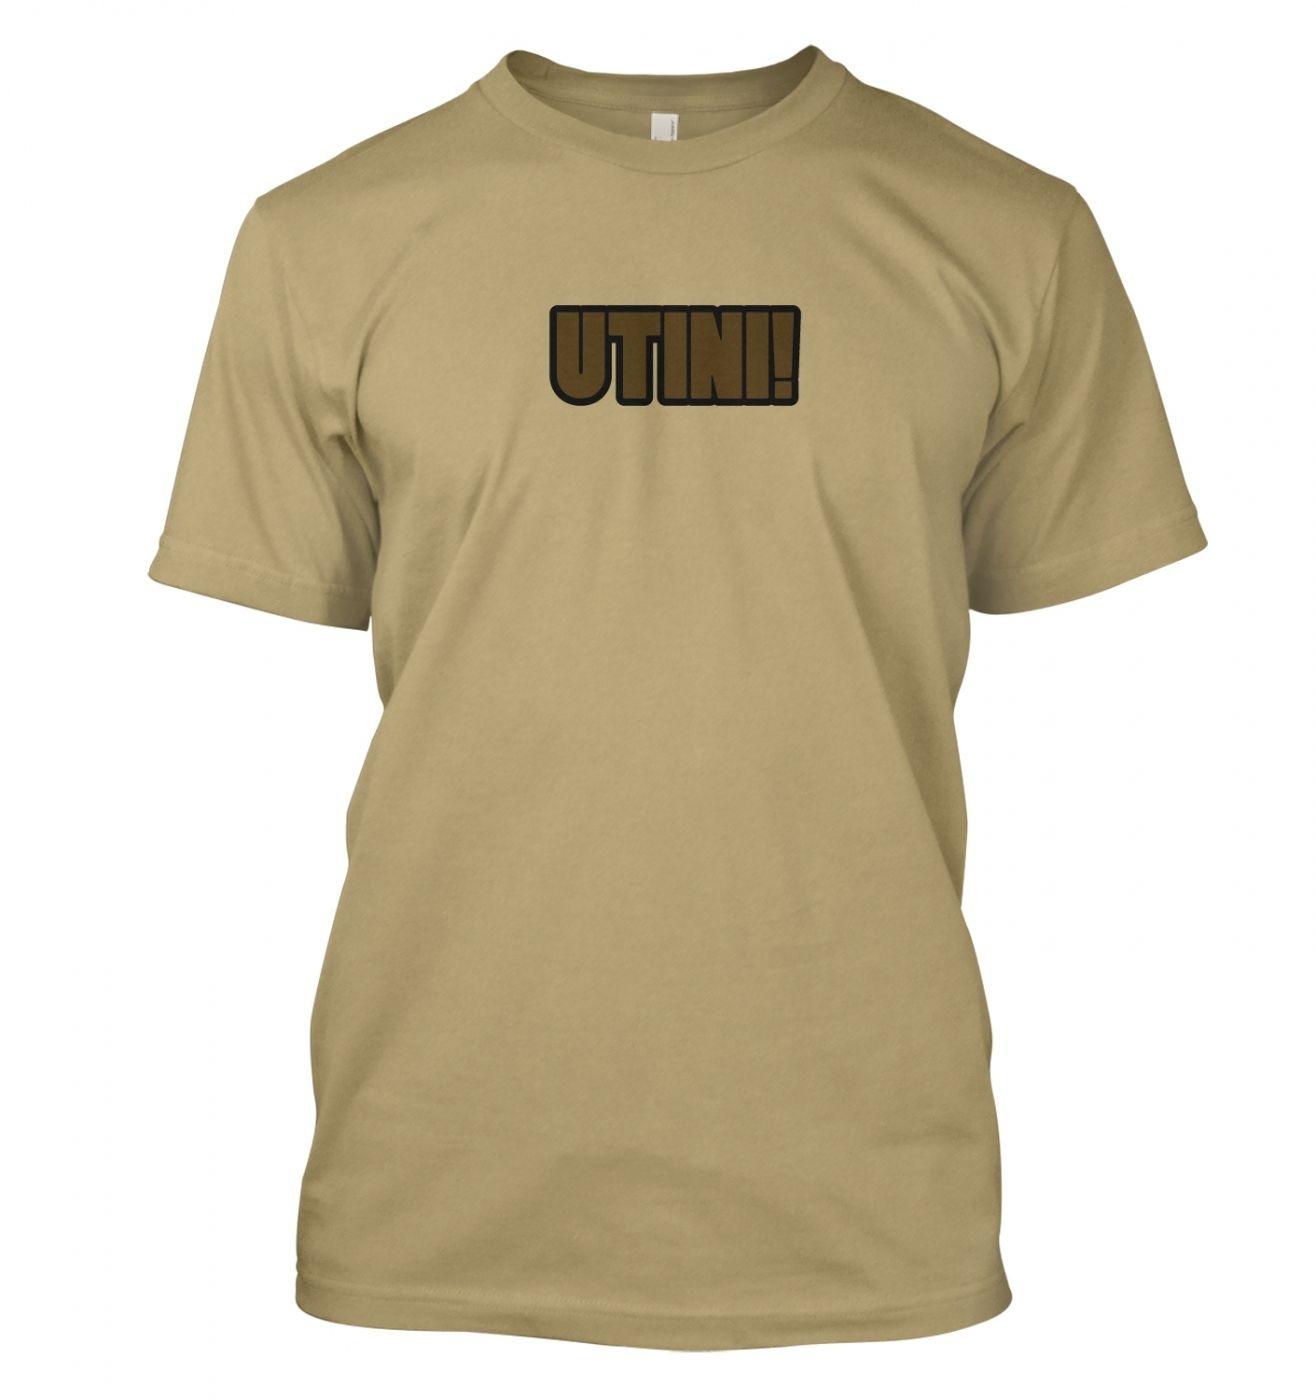 Utini Jawa Cry T-shirt - Inspired by Star Wars